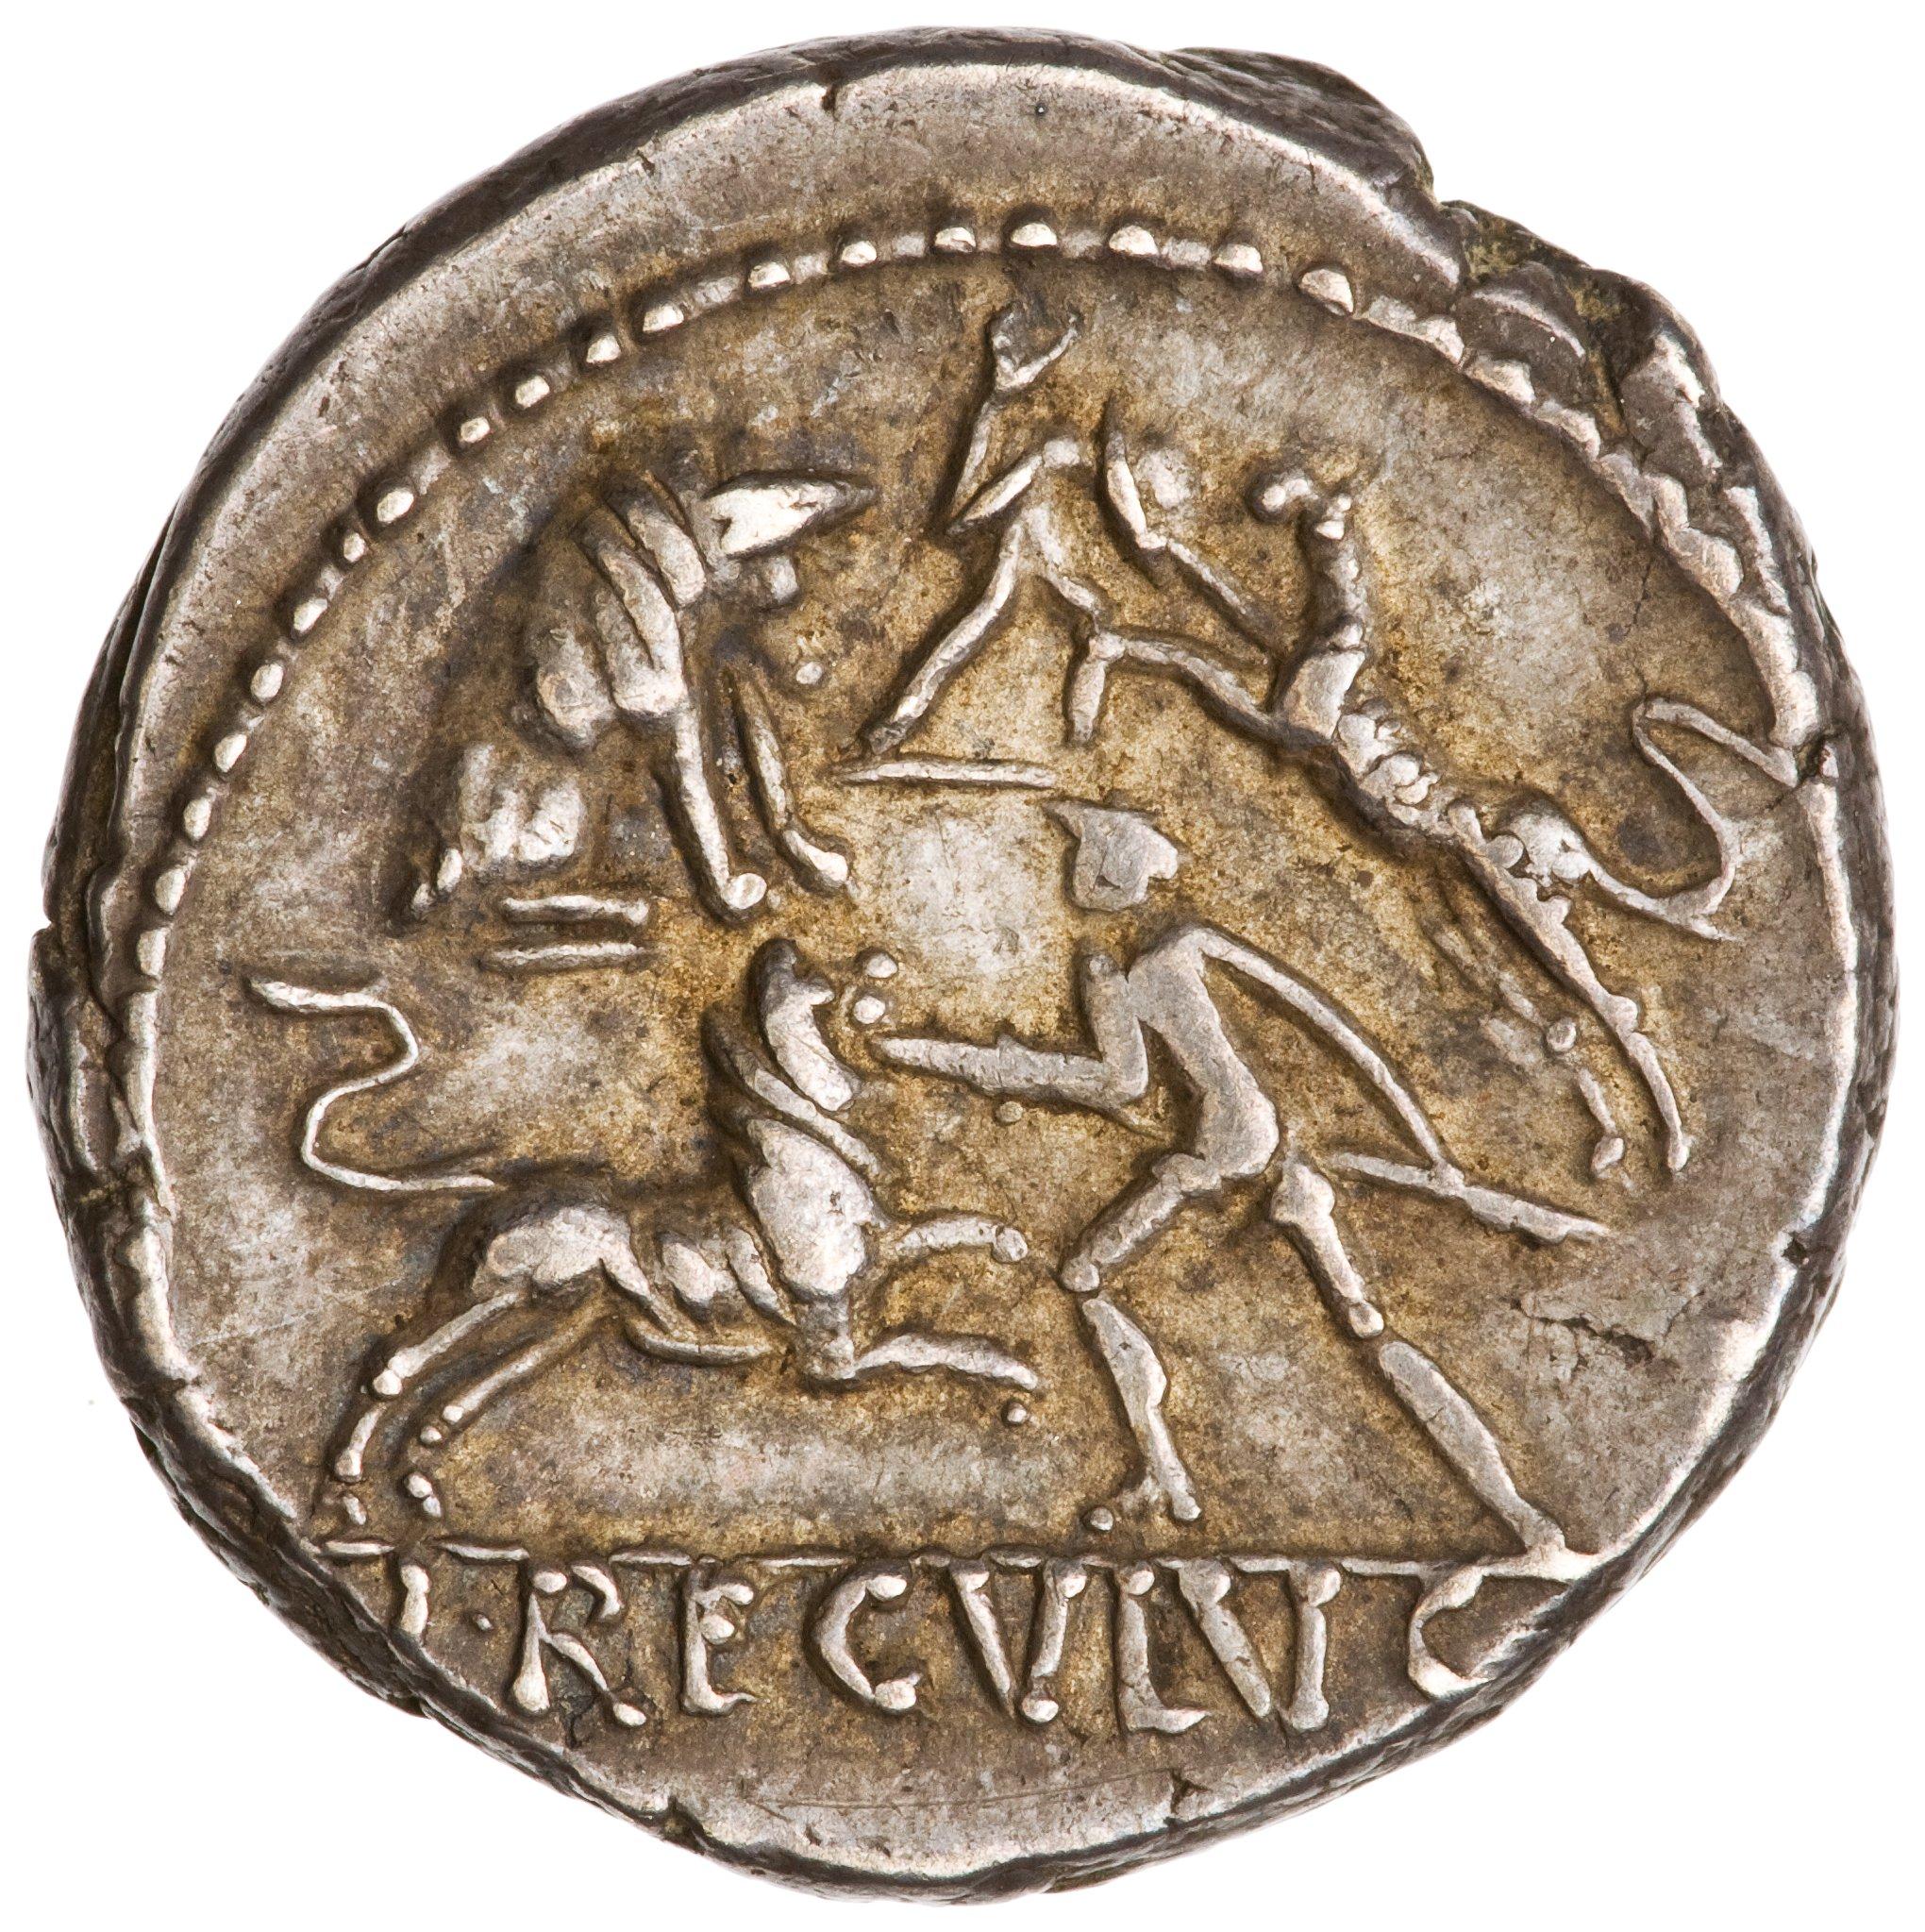 https://i2.wp.com/numismatics.org/collectionimages/19001949/1944/1944.100.4509.rev.noscale.jpg